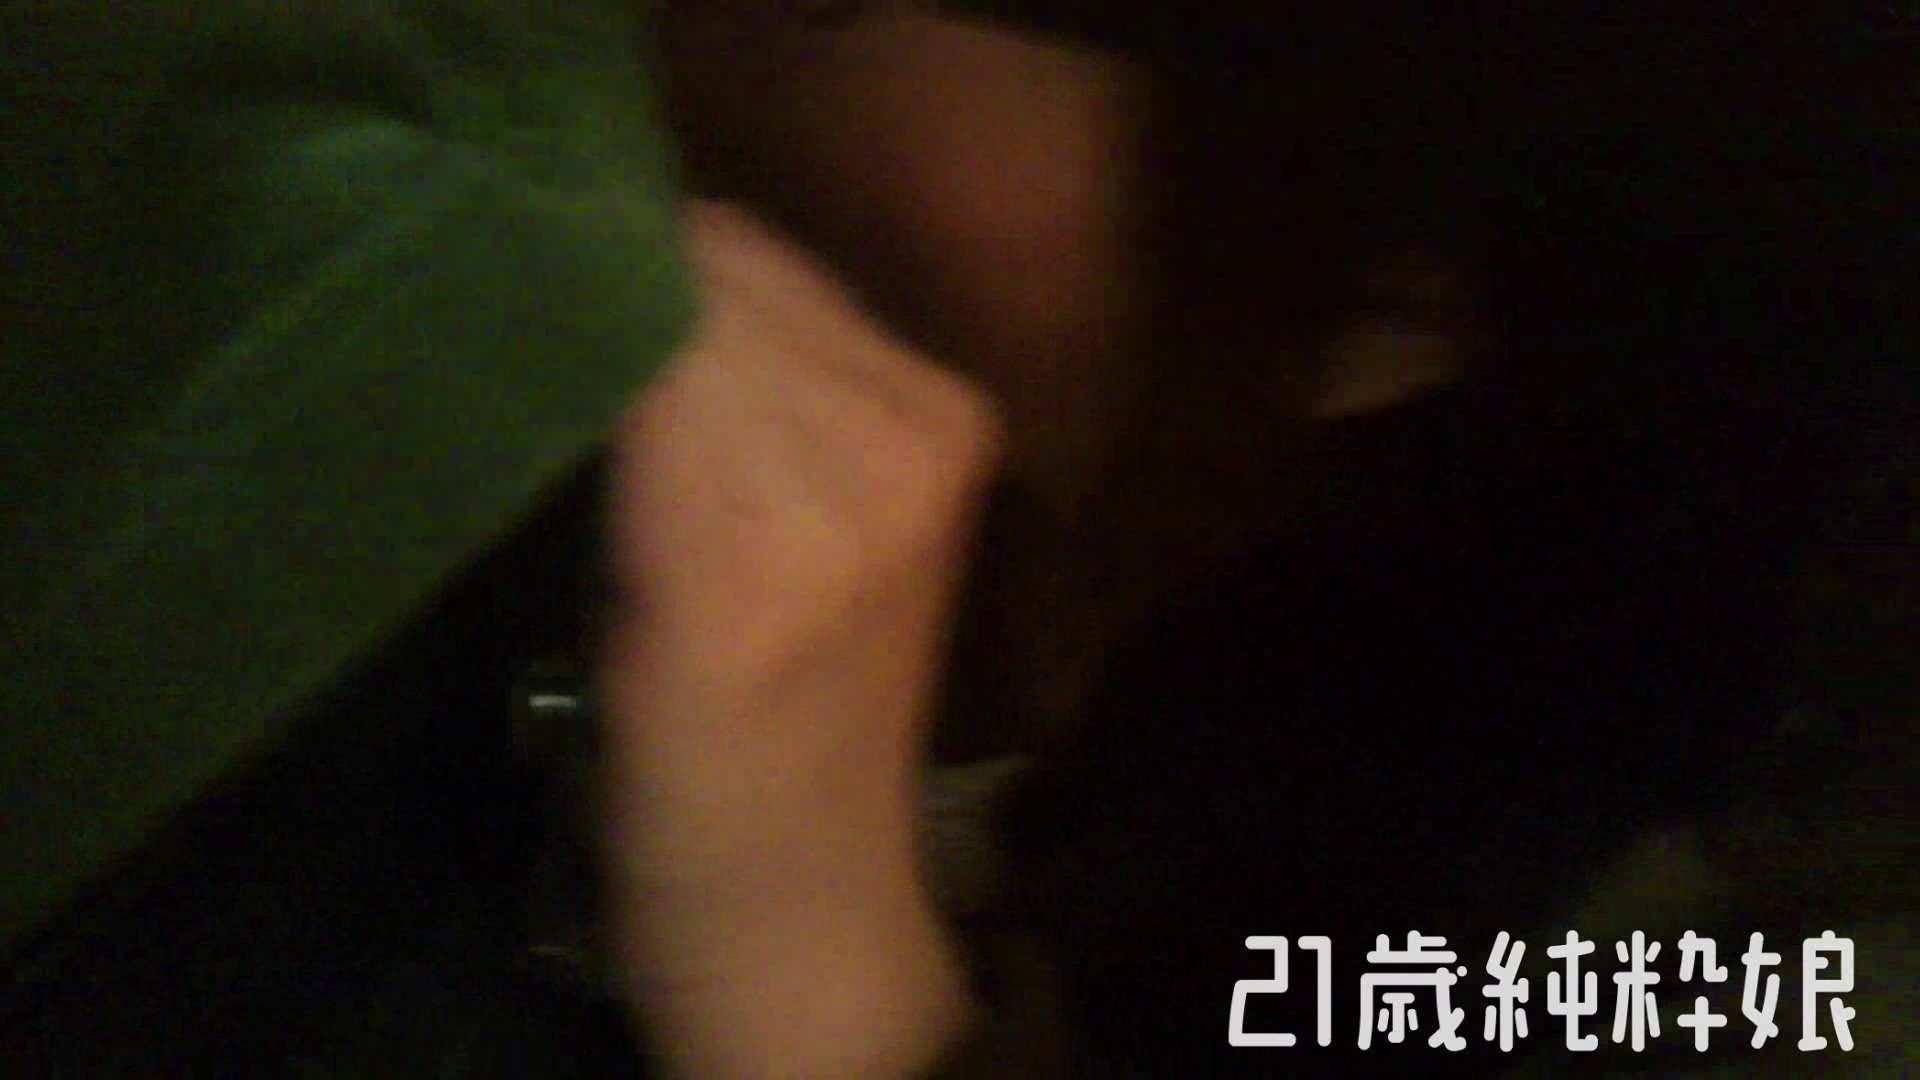 Gカップ21歳純粋嬢第2弾Vol.5 OLヌード天国  110PIX 48